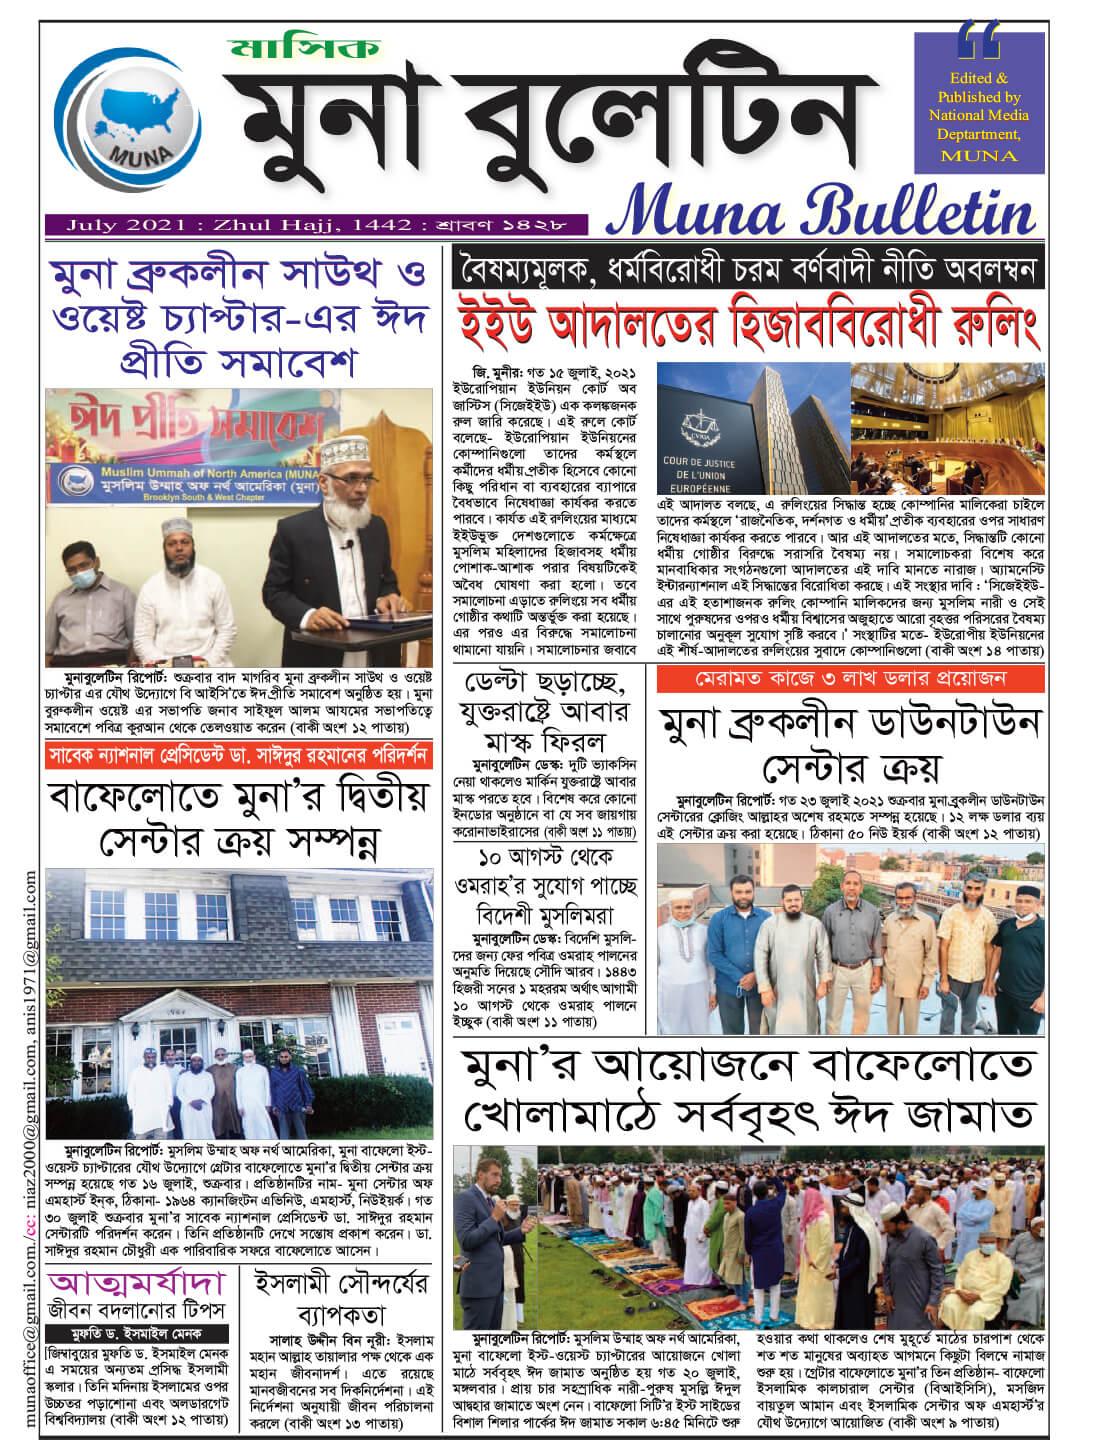 Bulletin of August